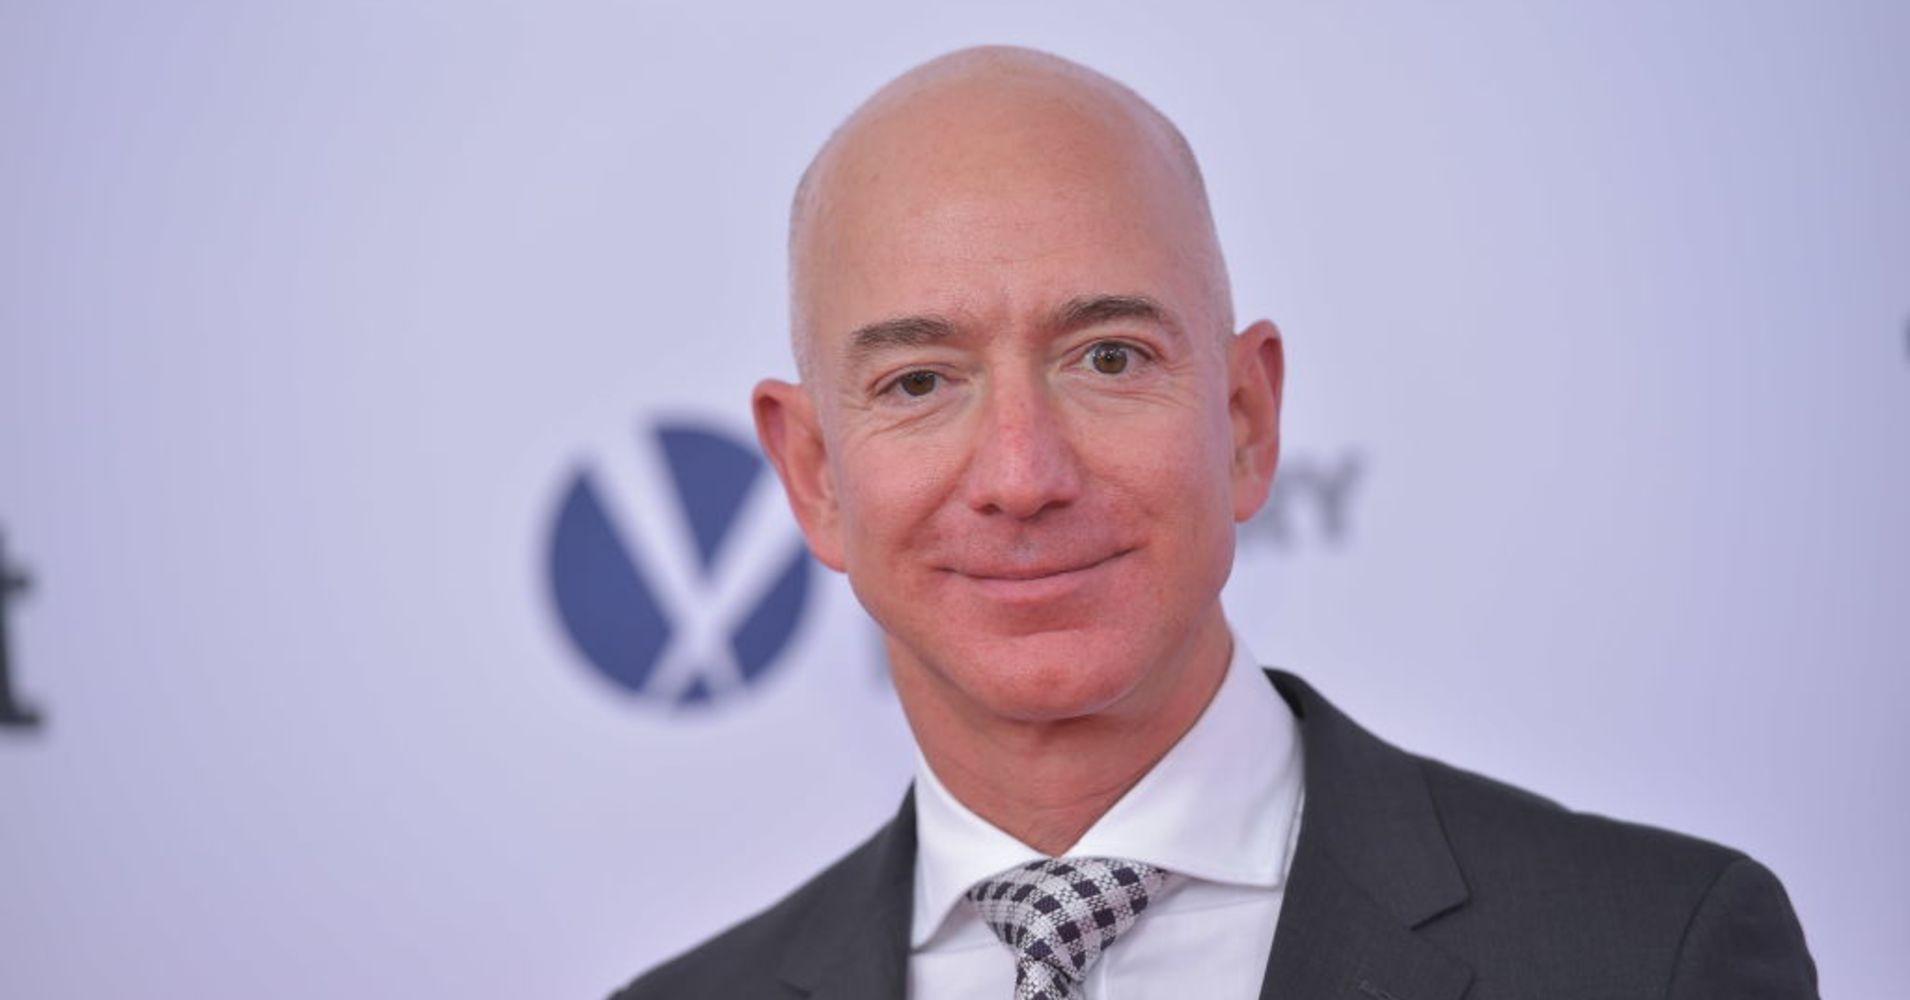 A question from Jeff Bezos changed how Tamara Mellon runs her business